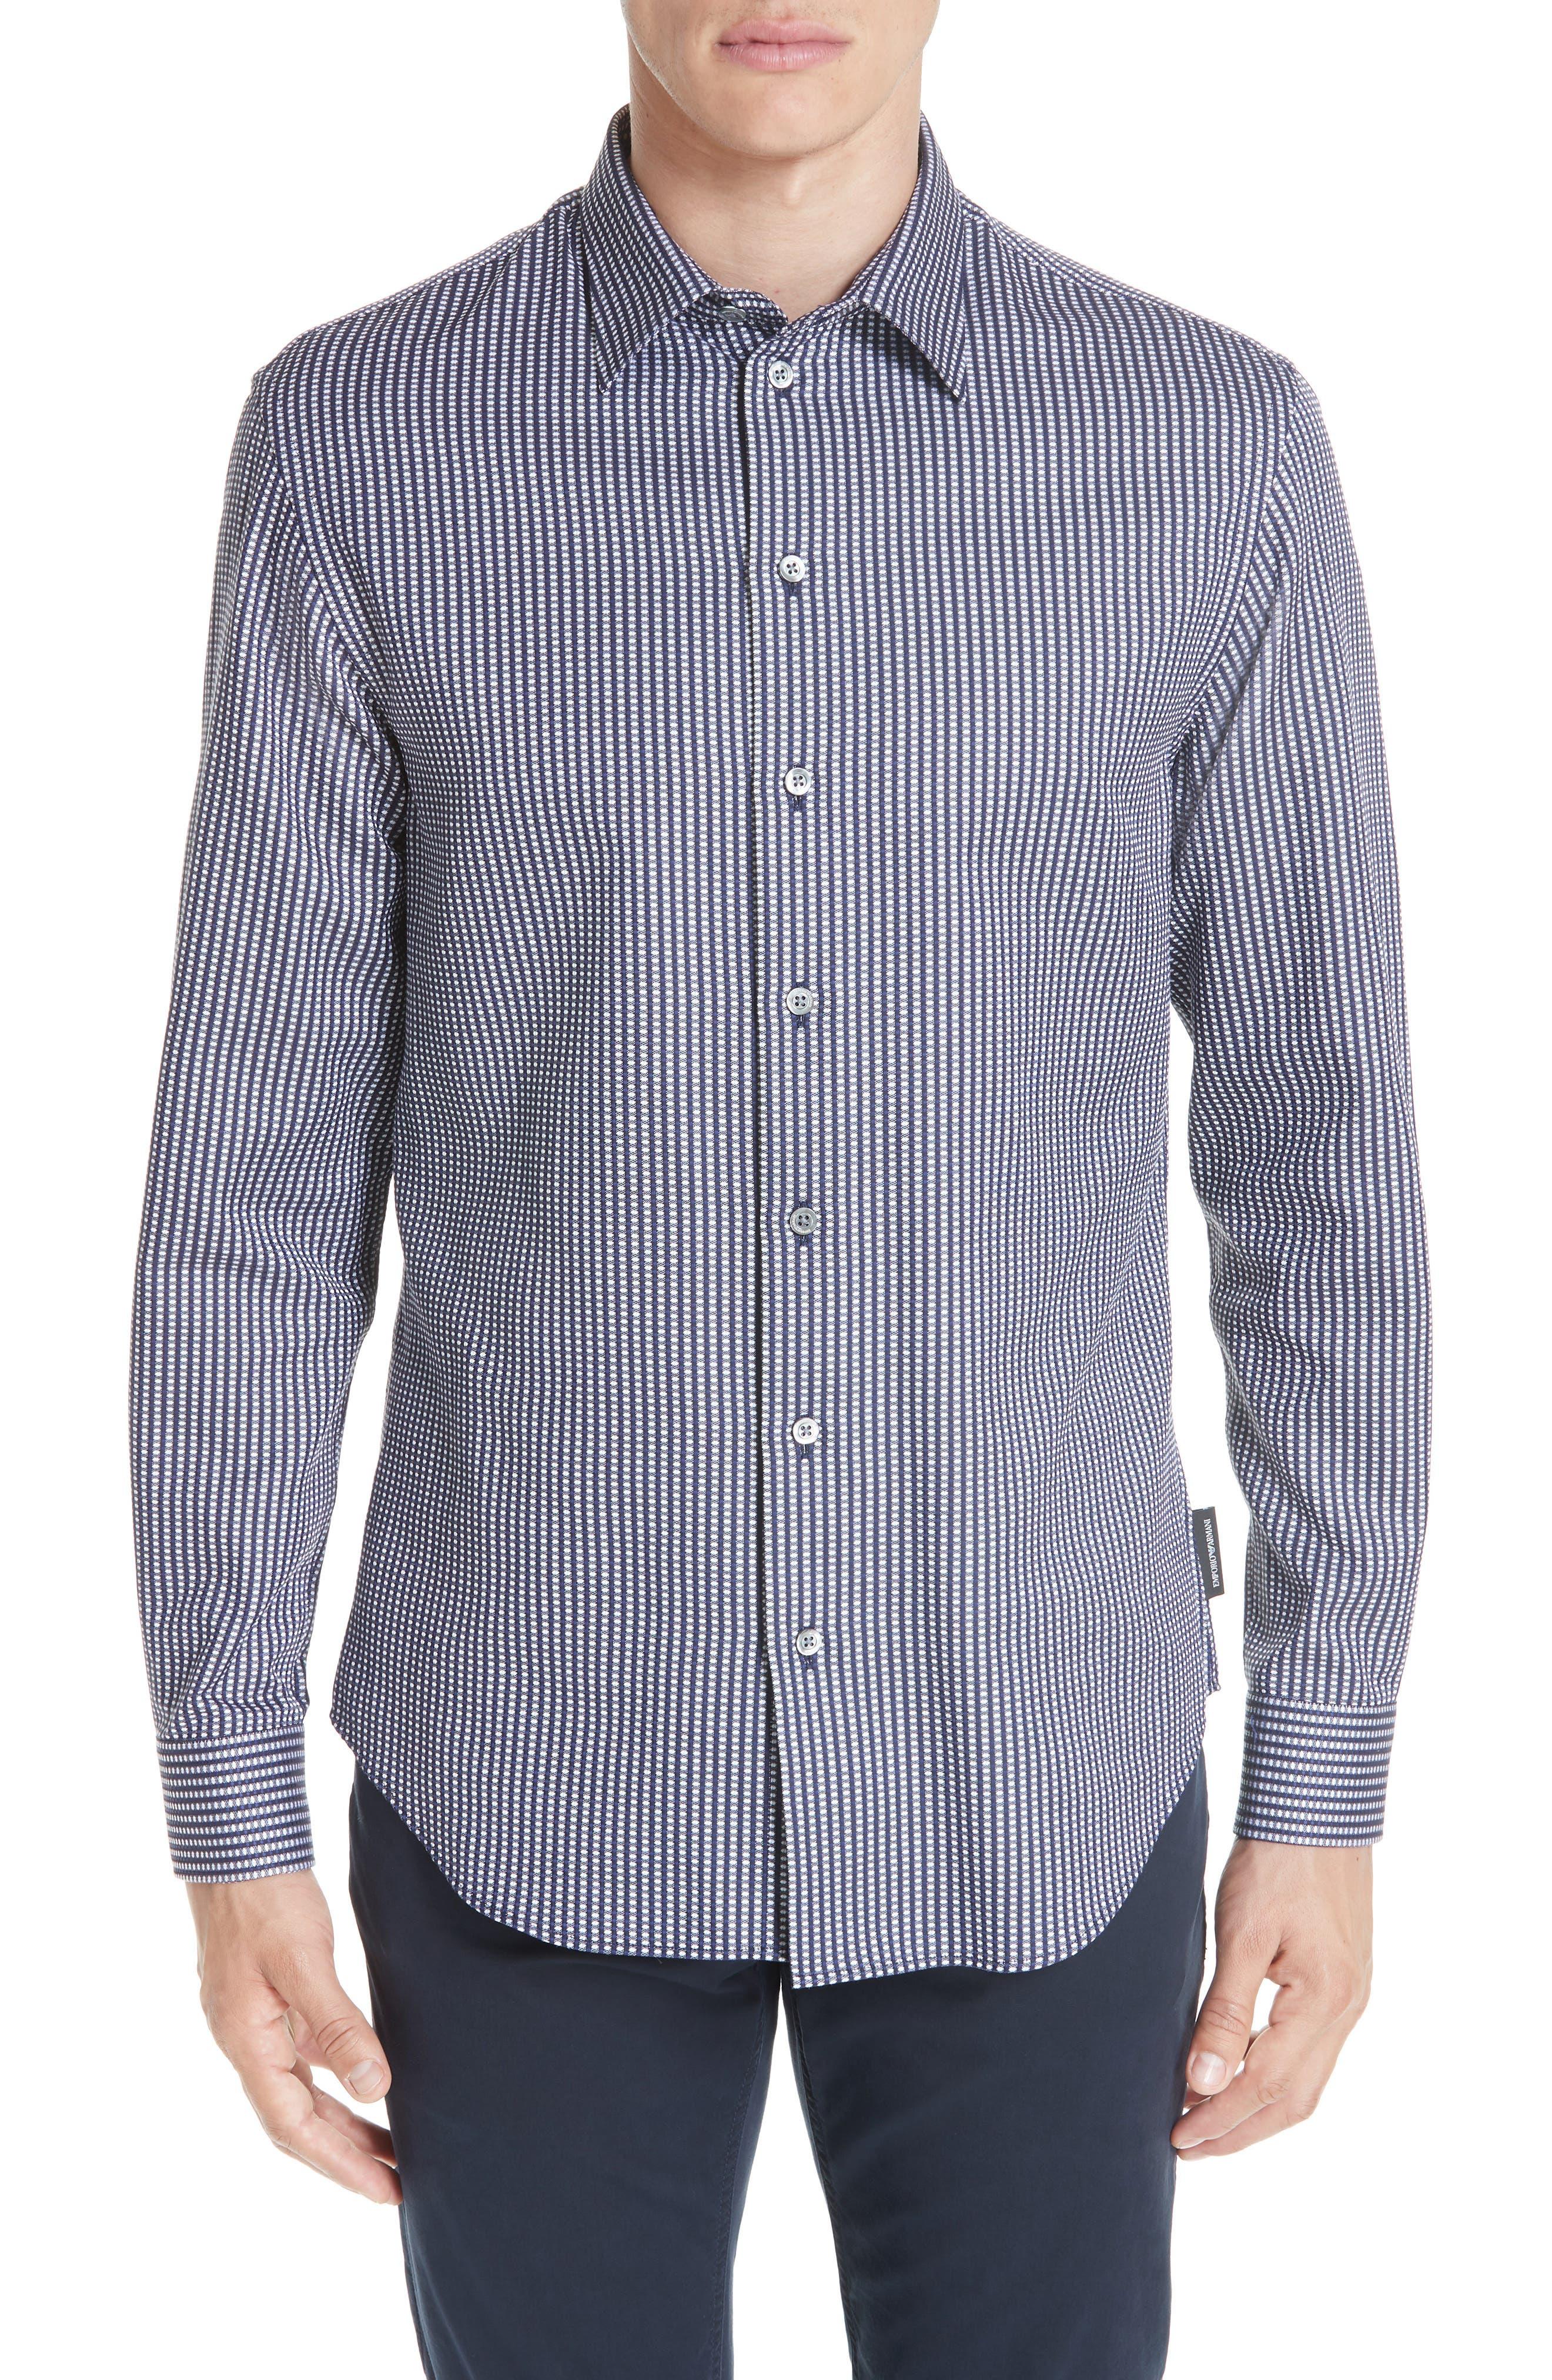 Regular Fit Solid Sport Shirt,                             Main thumbnail 1, color,                             BLUE MULTI